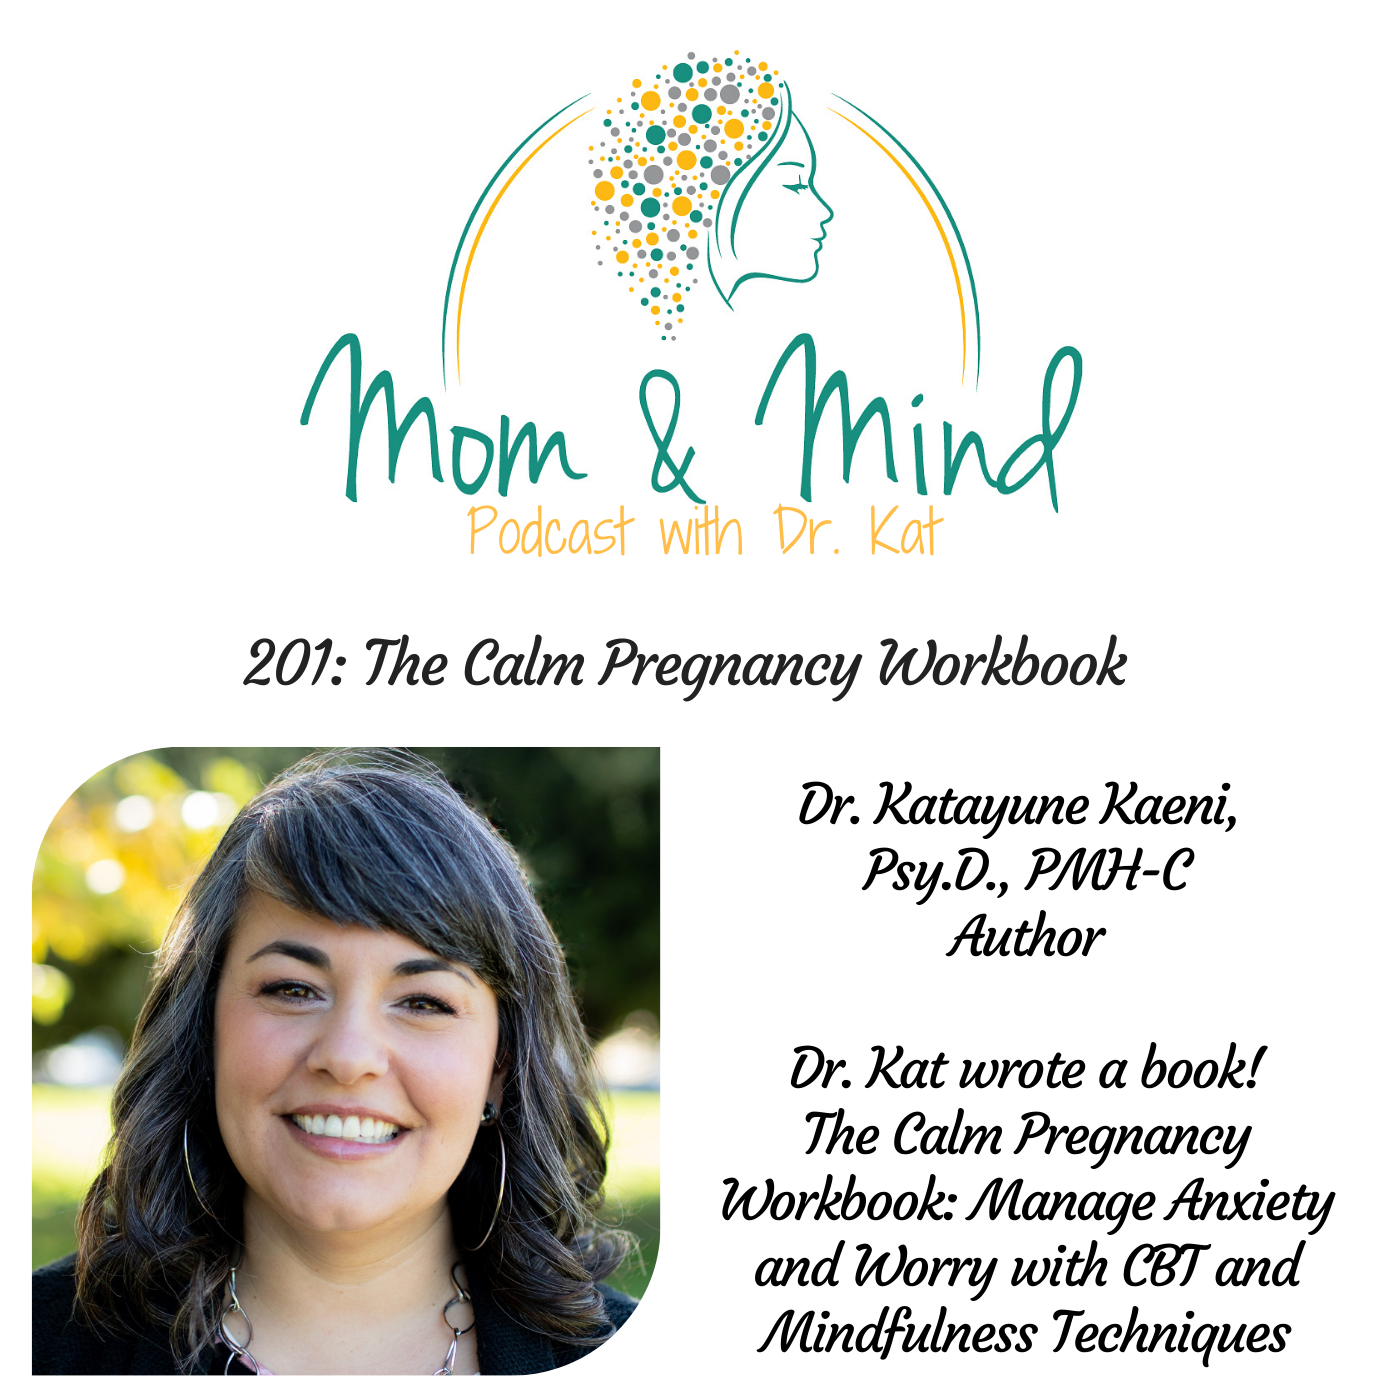 201: The Pregnancy Workbook with Dr. Katayune Kaeni, Psy.D., PMH-C